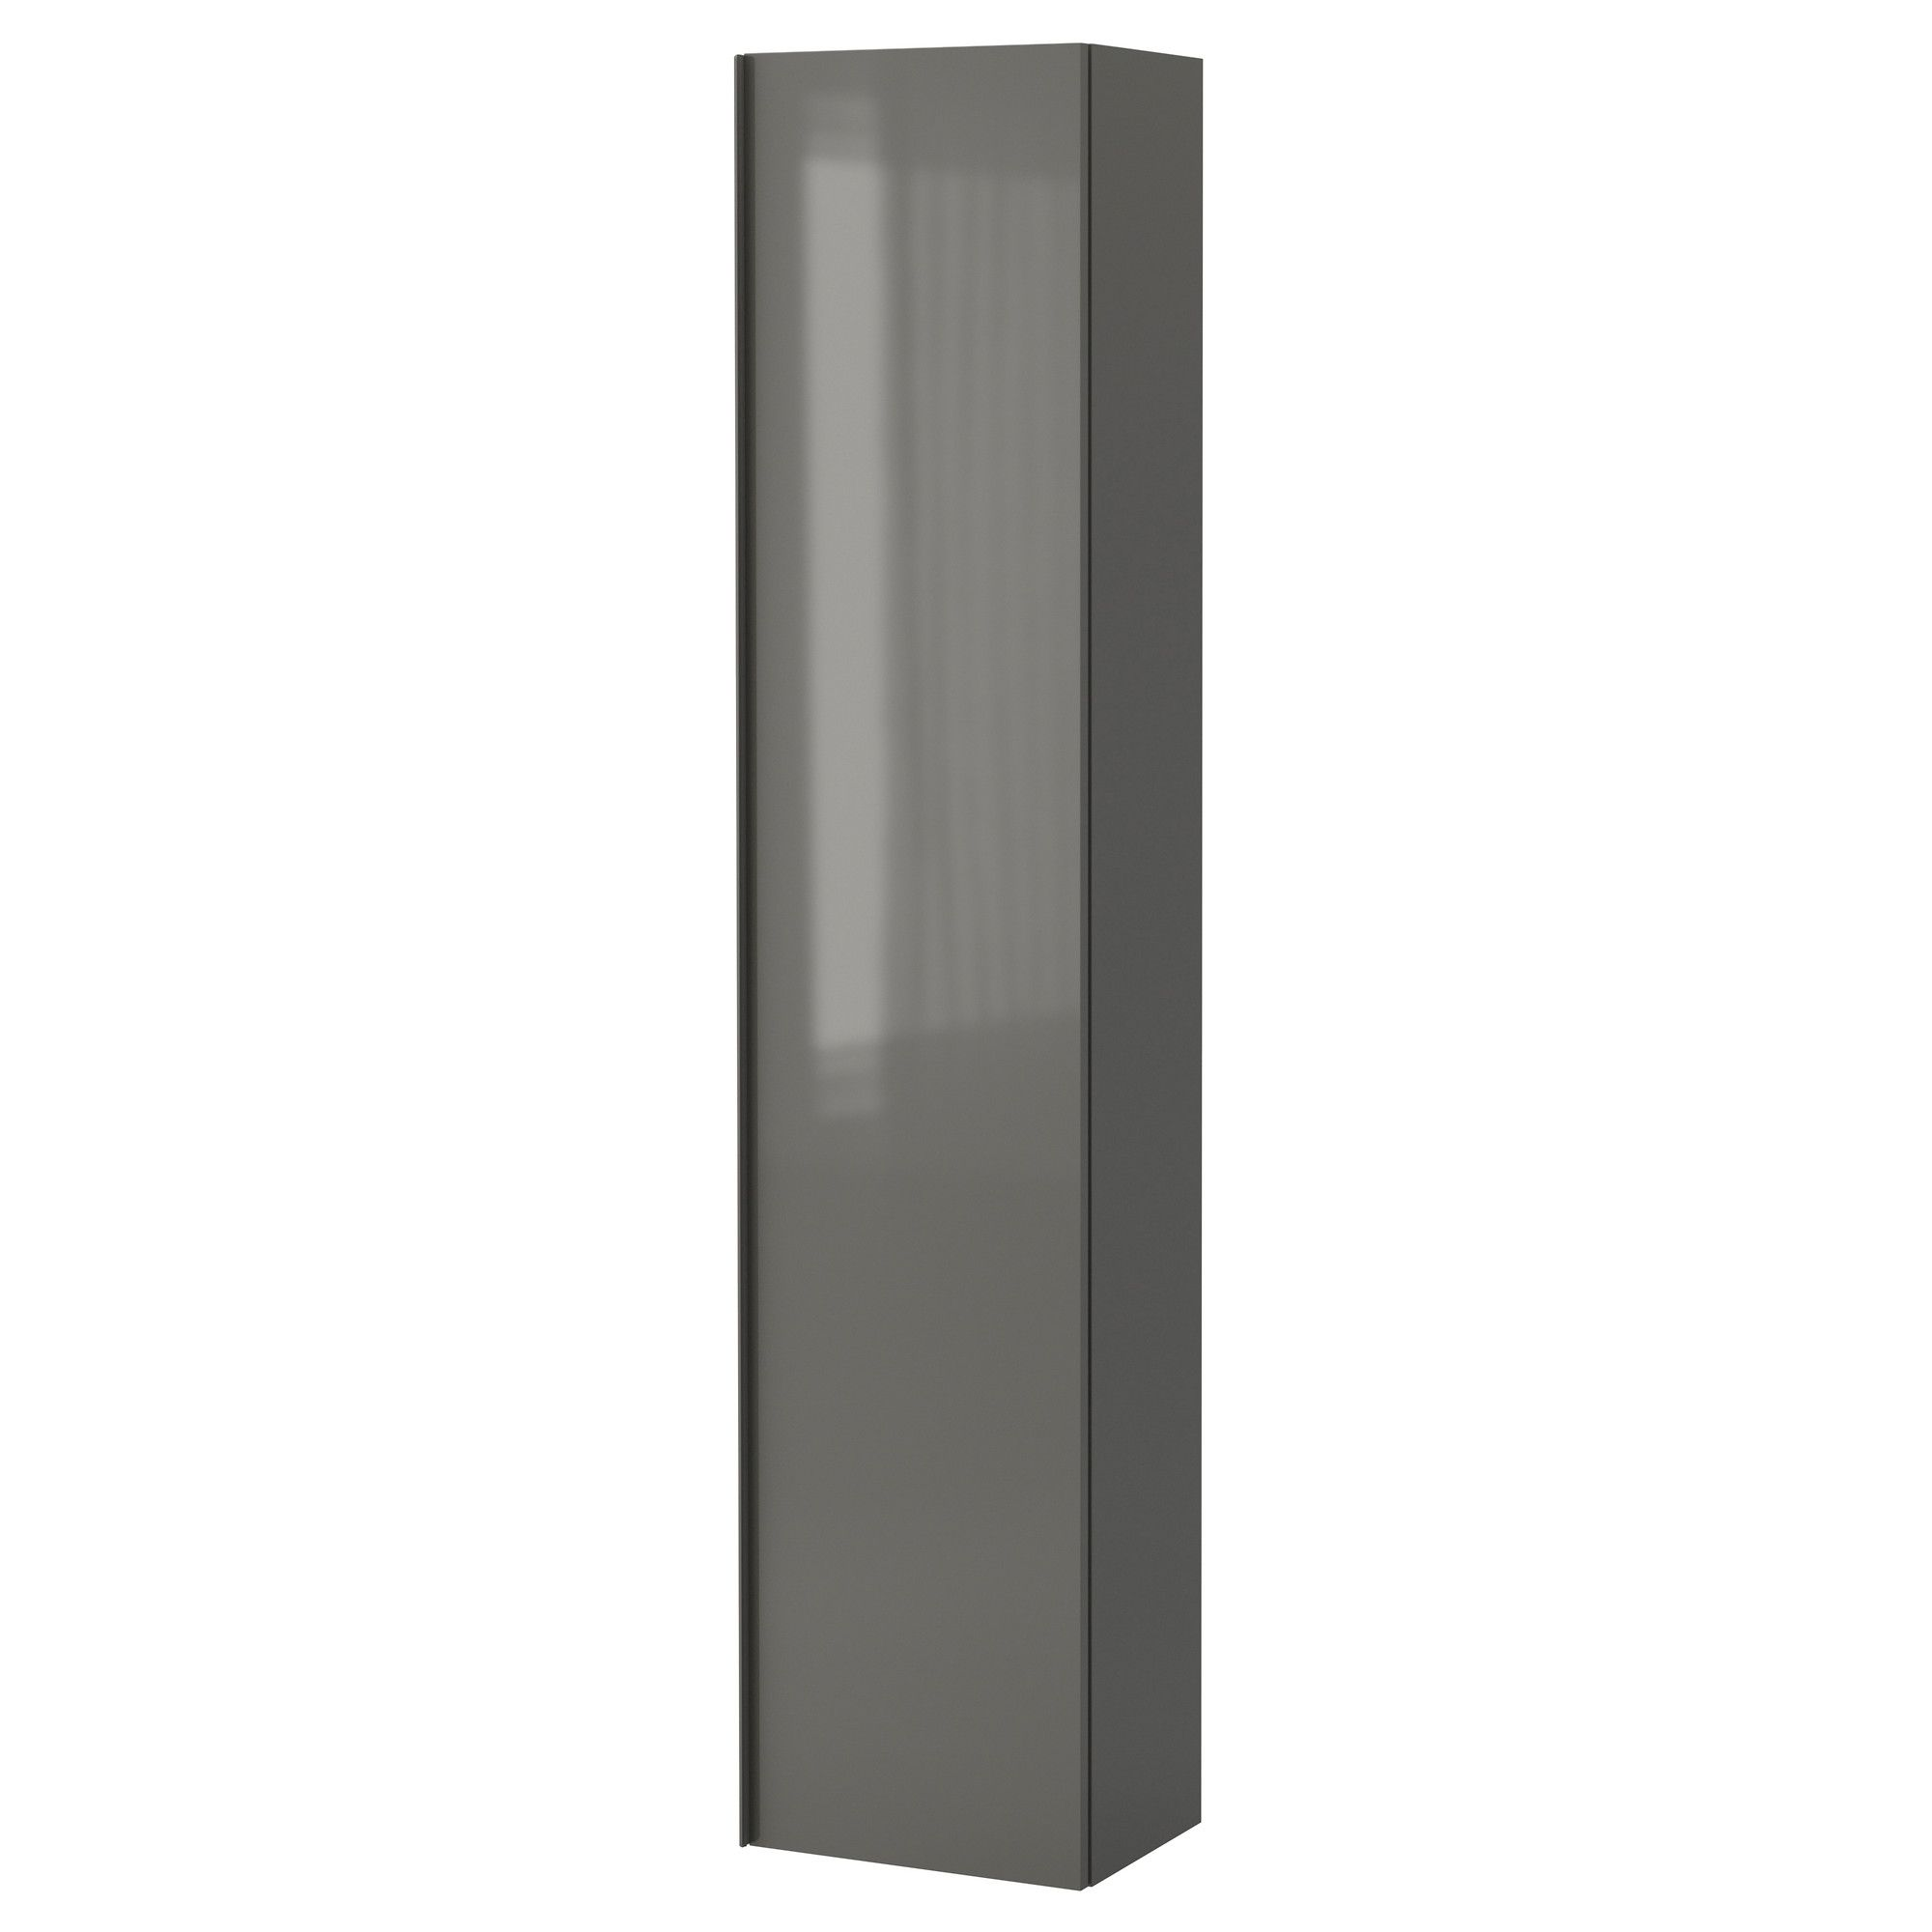 boys bathroom: ikea godmorgon high cabinet - high gloss gray. we, Deco ideeën